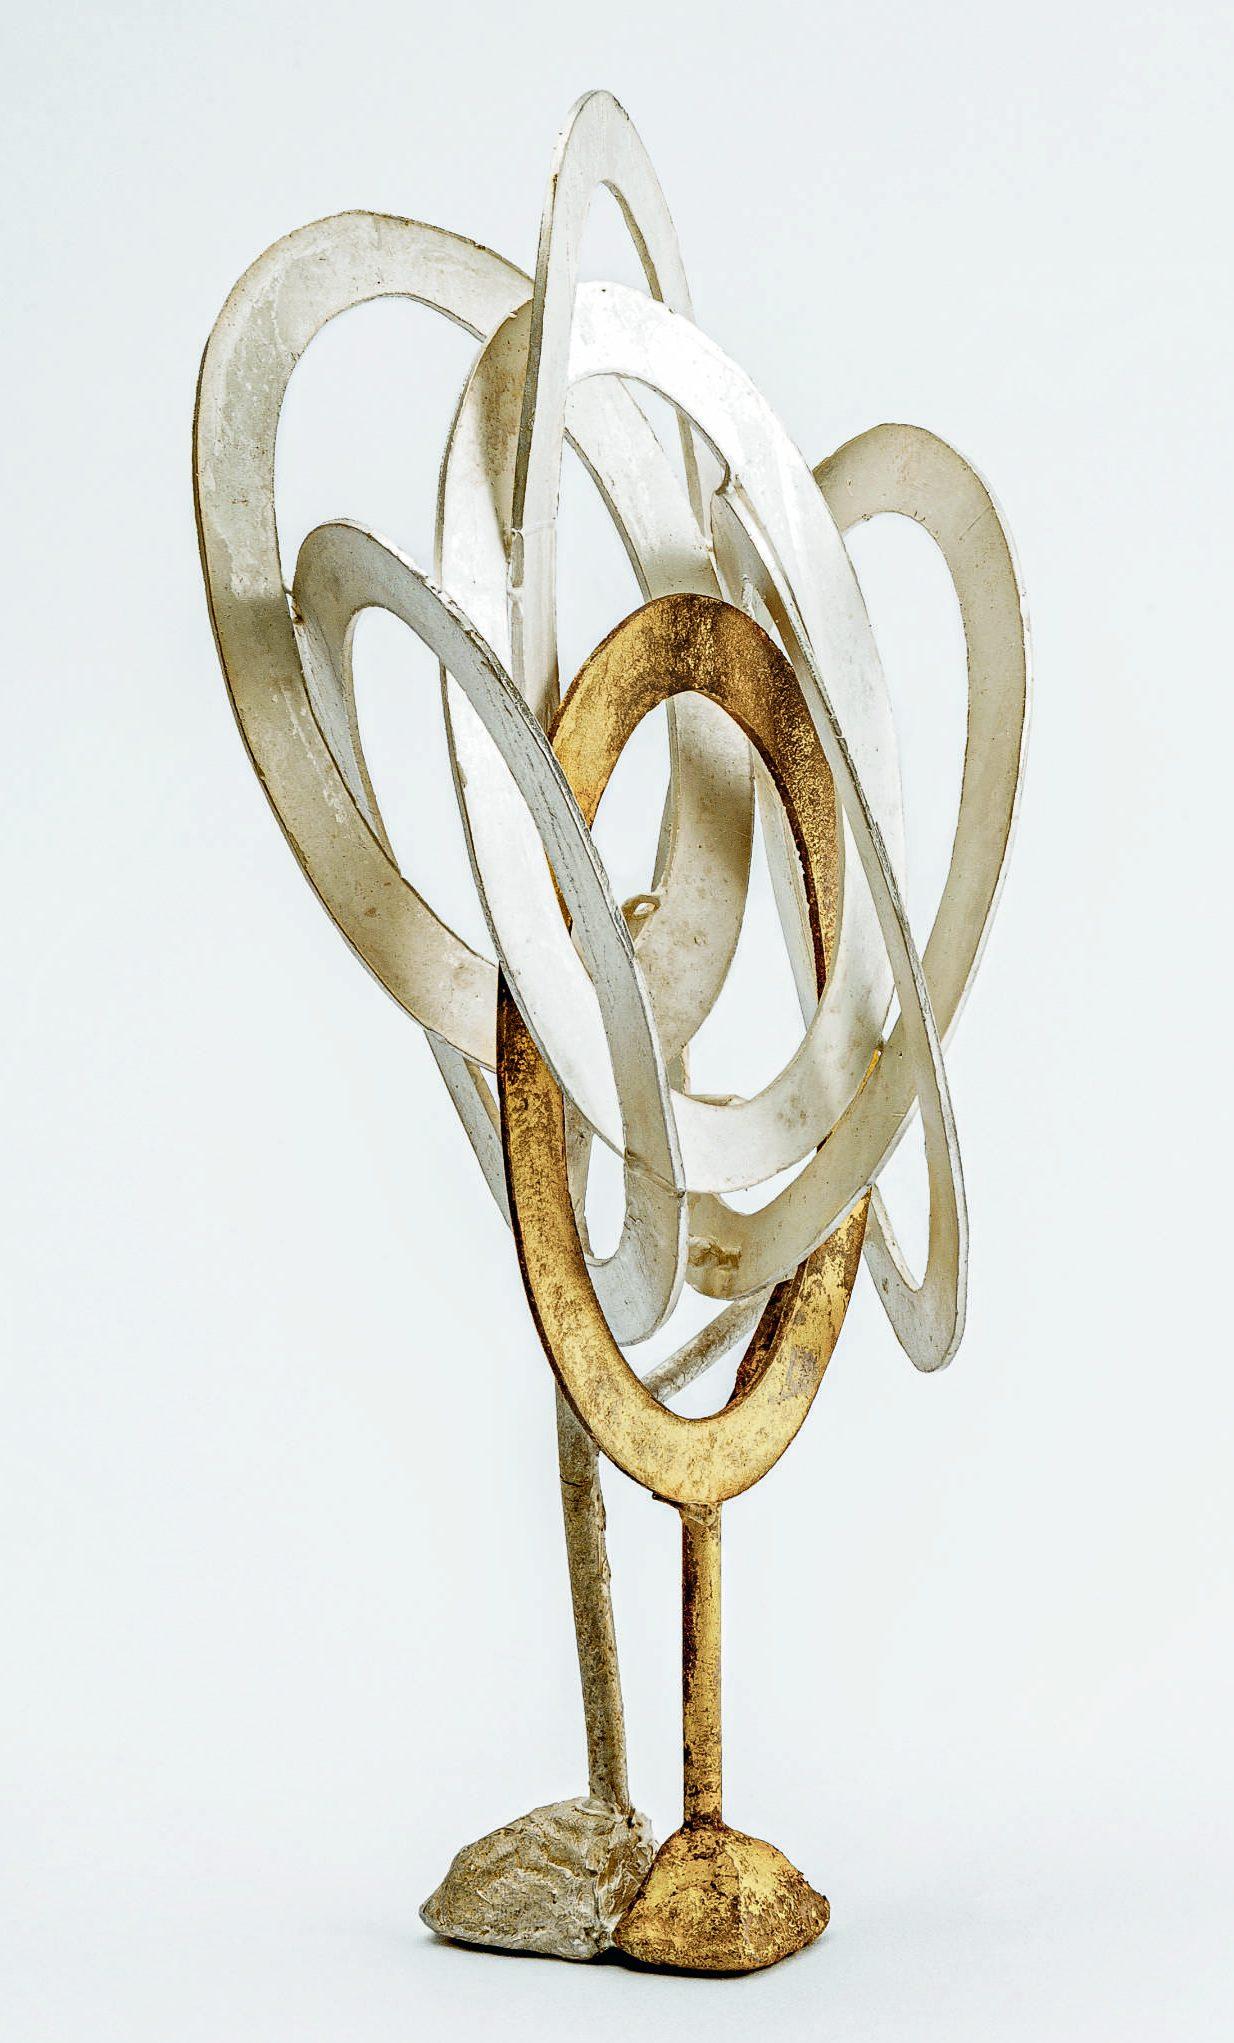 Peter Bauhuis, K7, object/halssieraad, 2019. Danner Ehrenpreis 2020. Foto Eva Jünger, zilver, goud